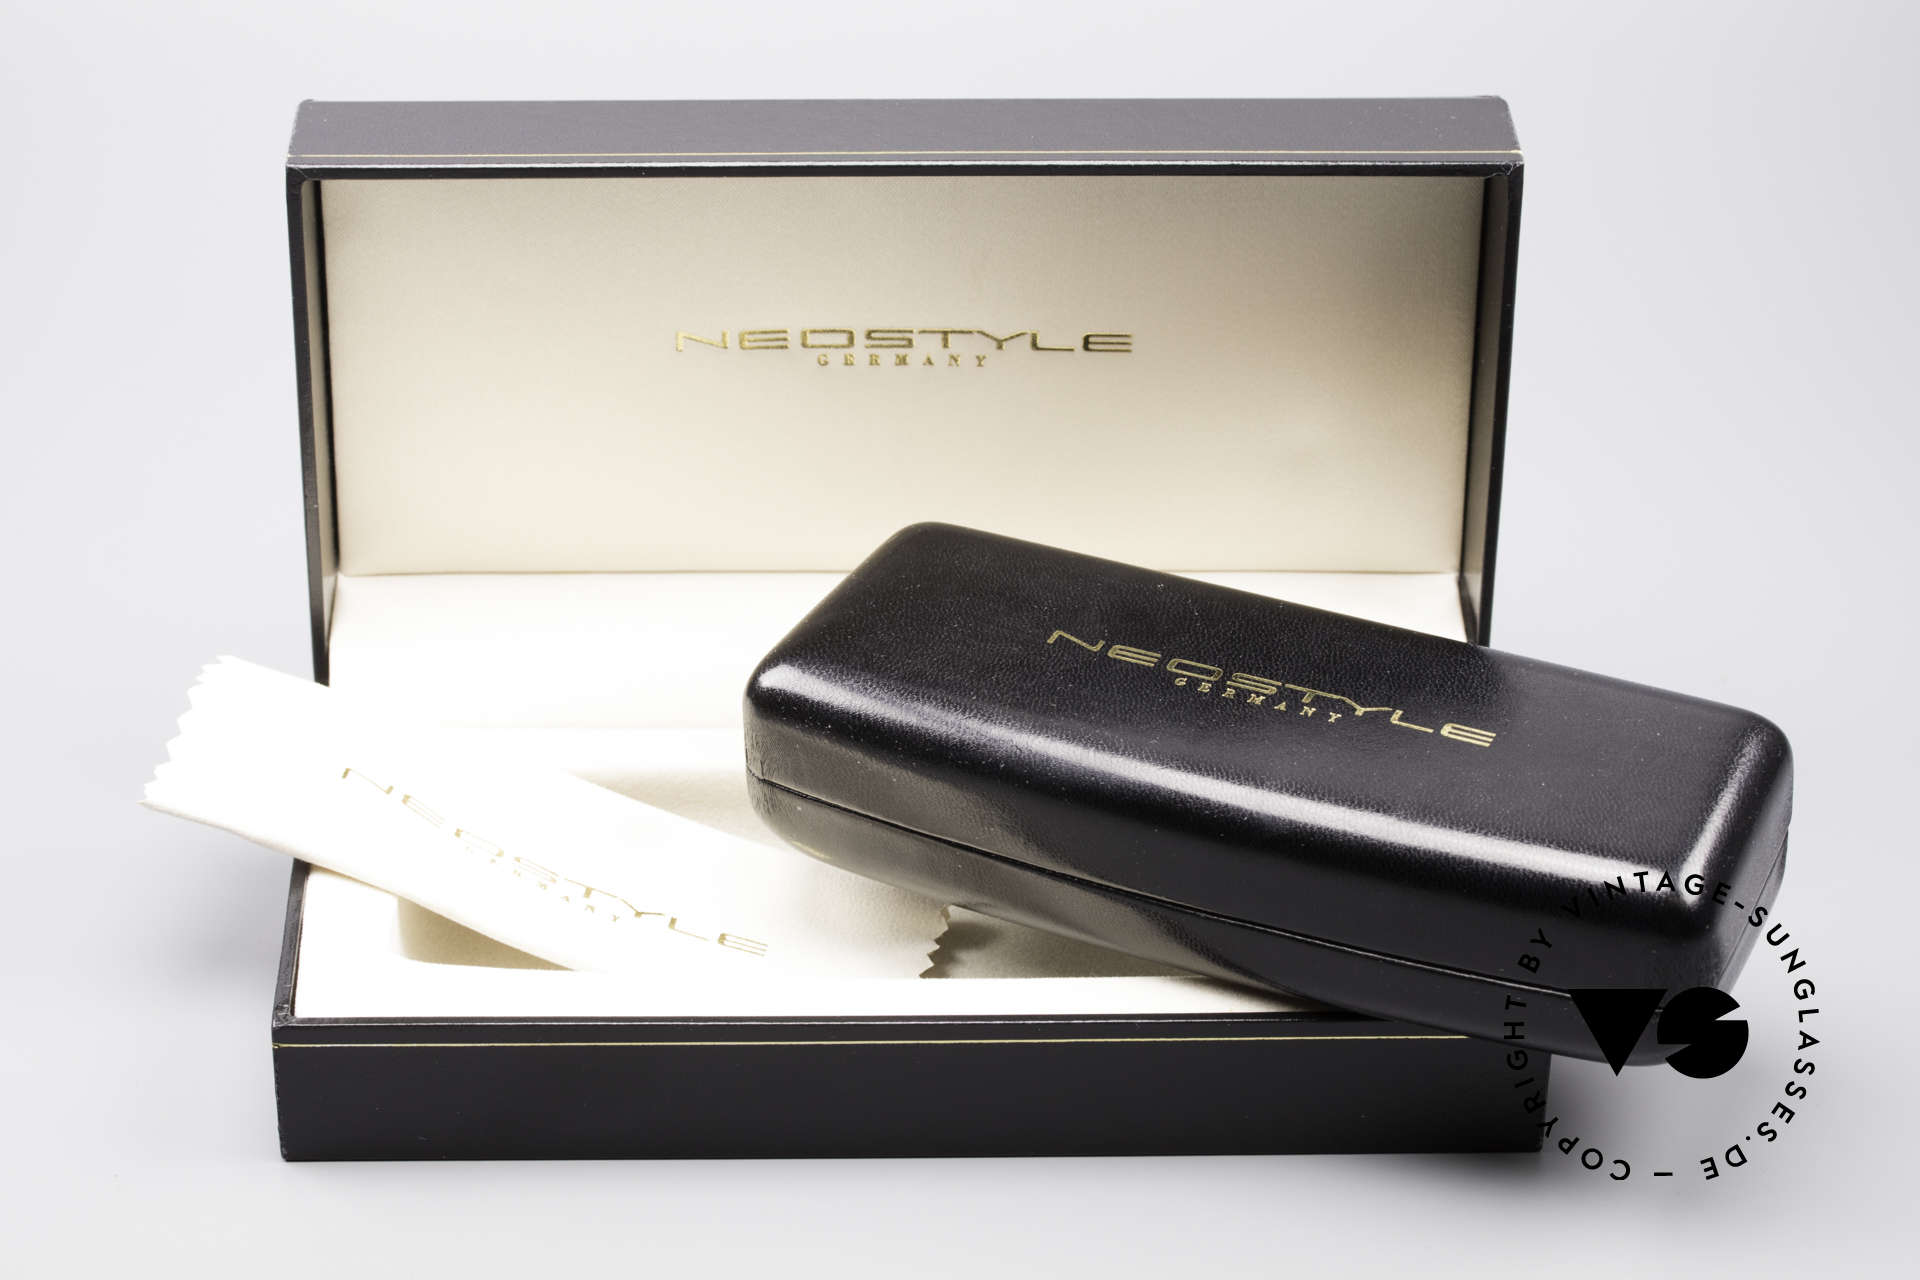 Neostyle Jet 40 Titanflex Vintage 90's Glasses, Size: medium, Made for Men